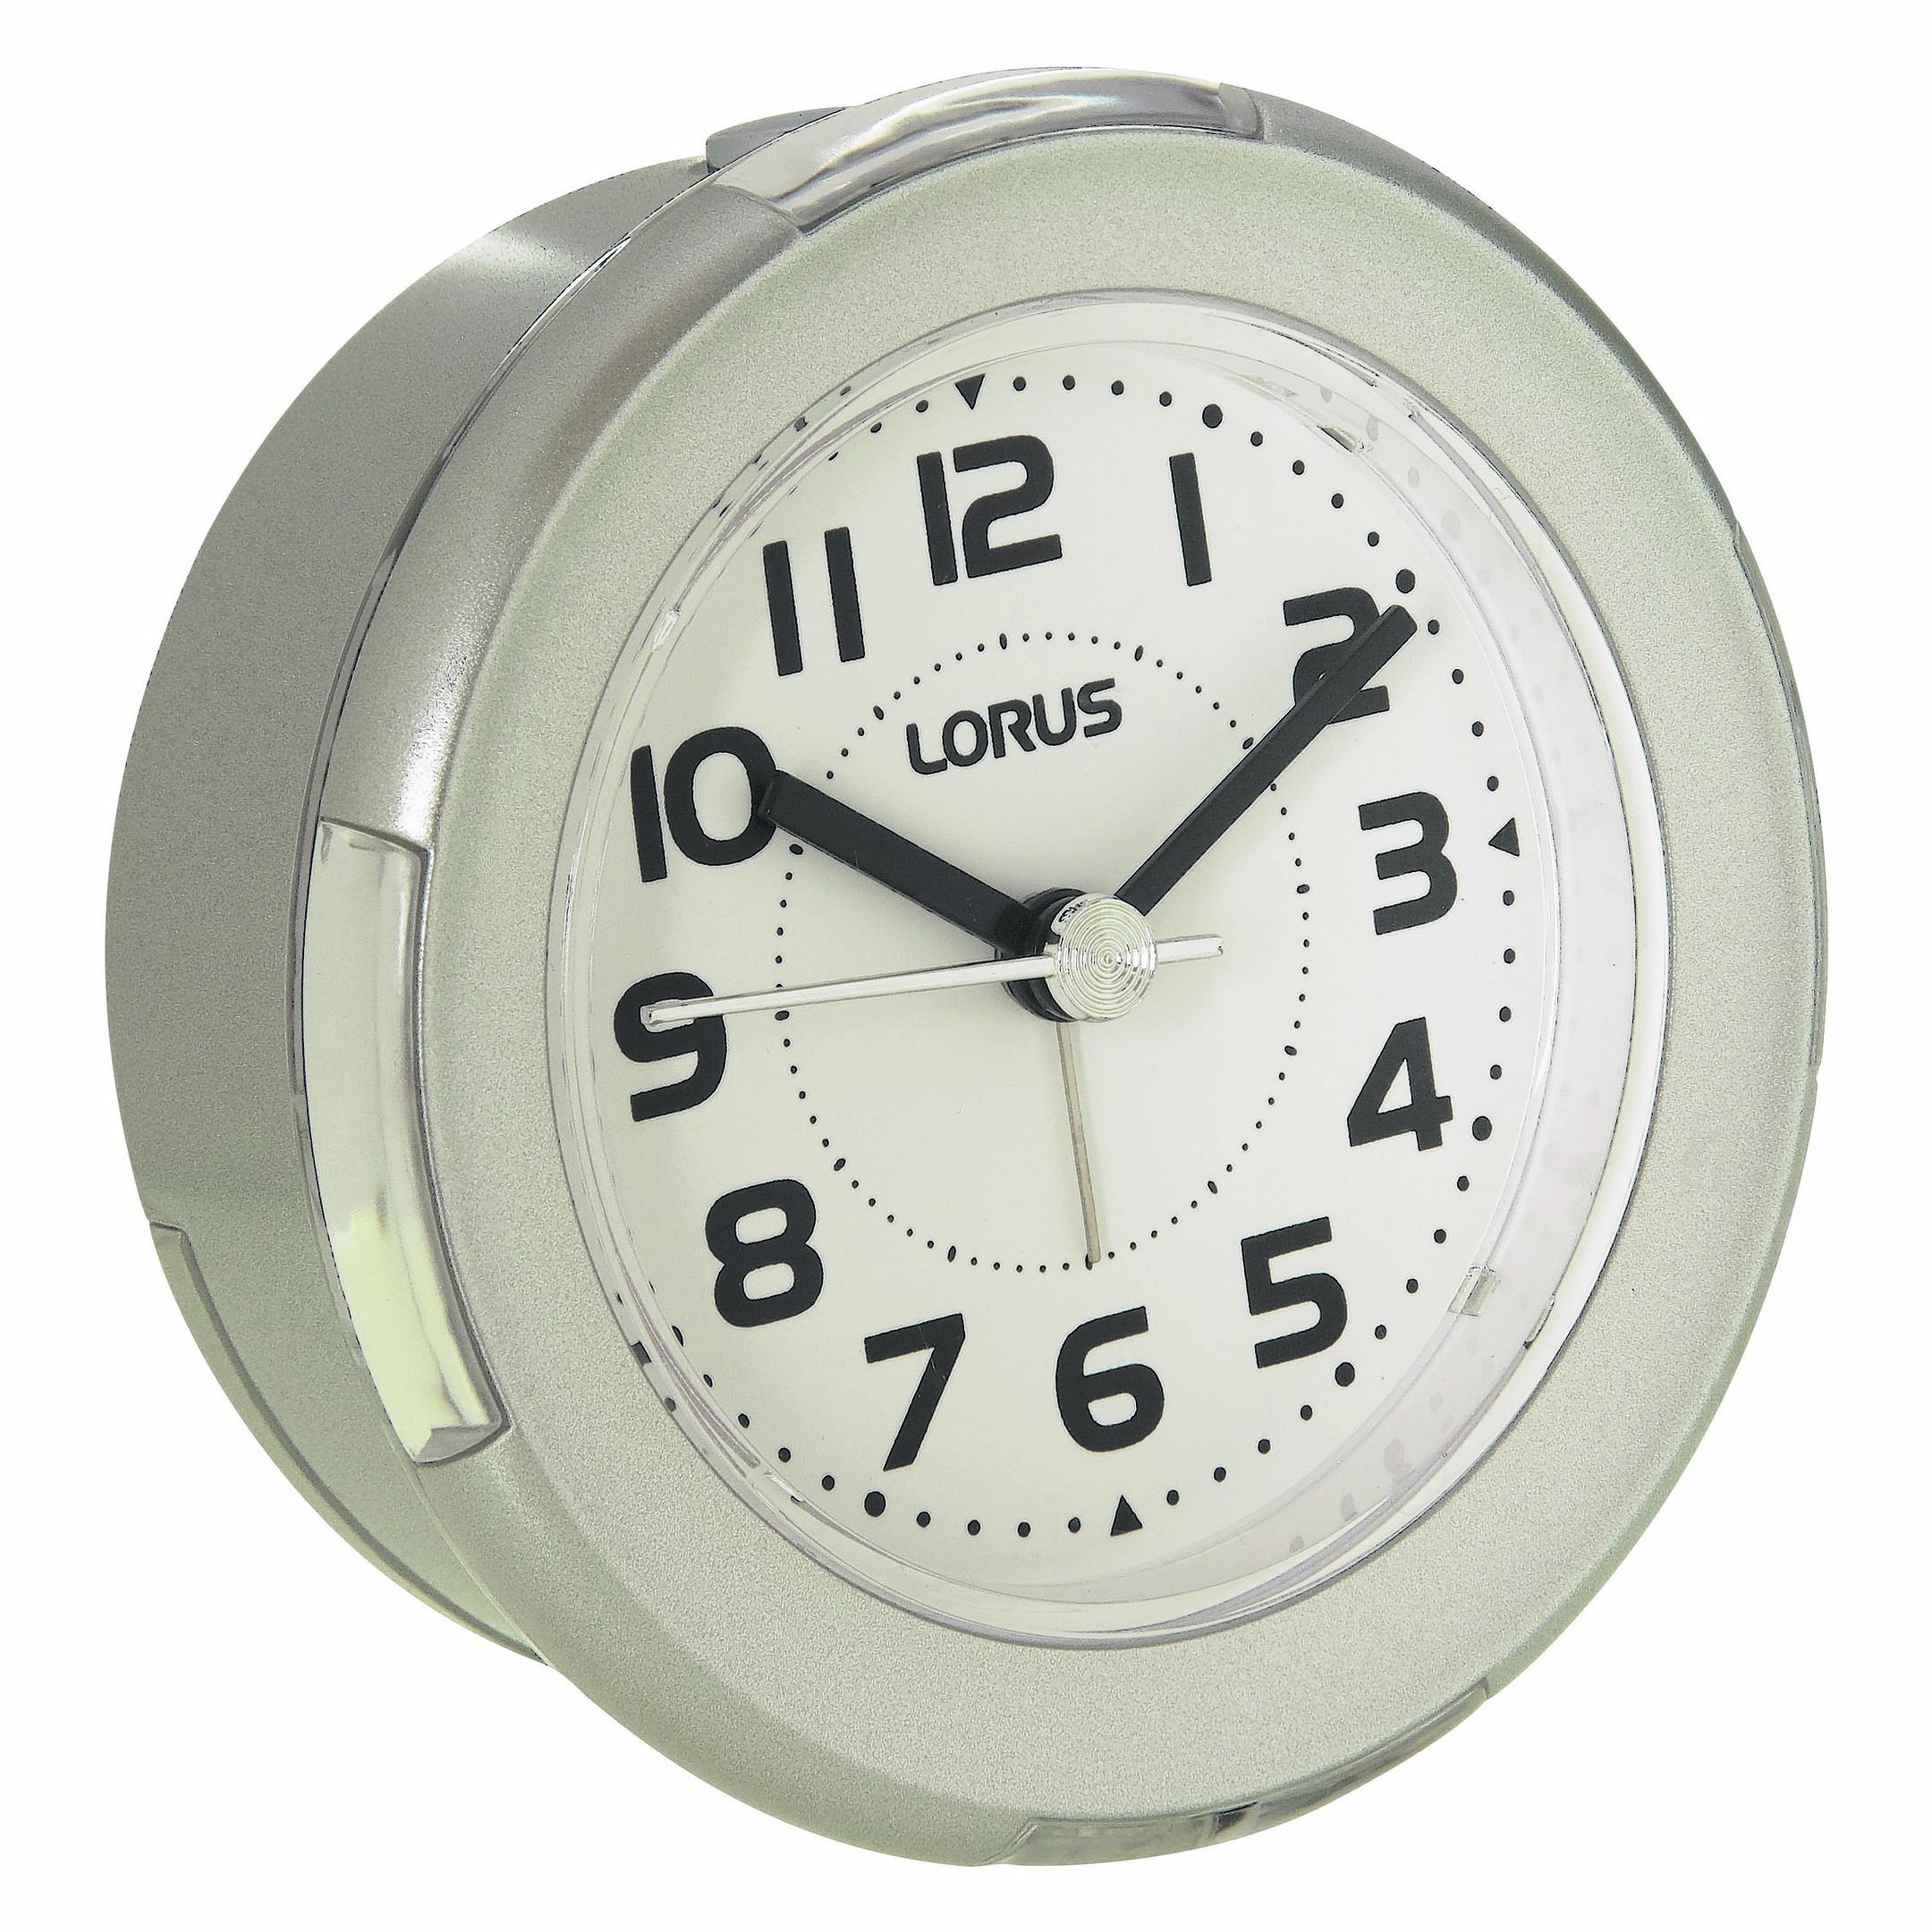 GADGETS Alarm Clocks 092350